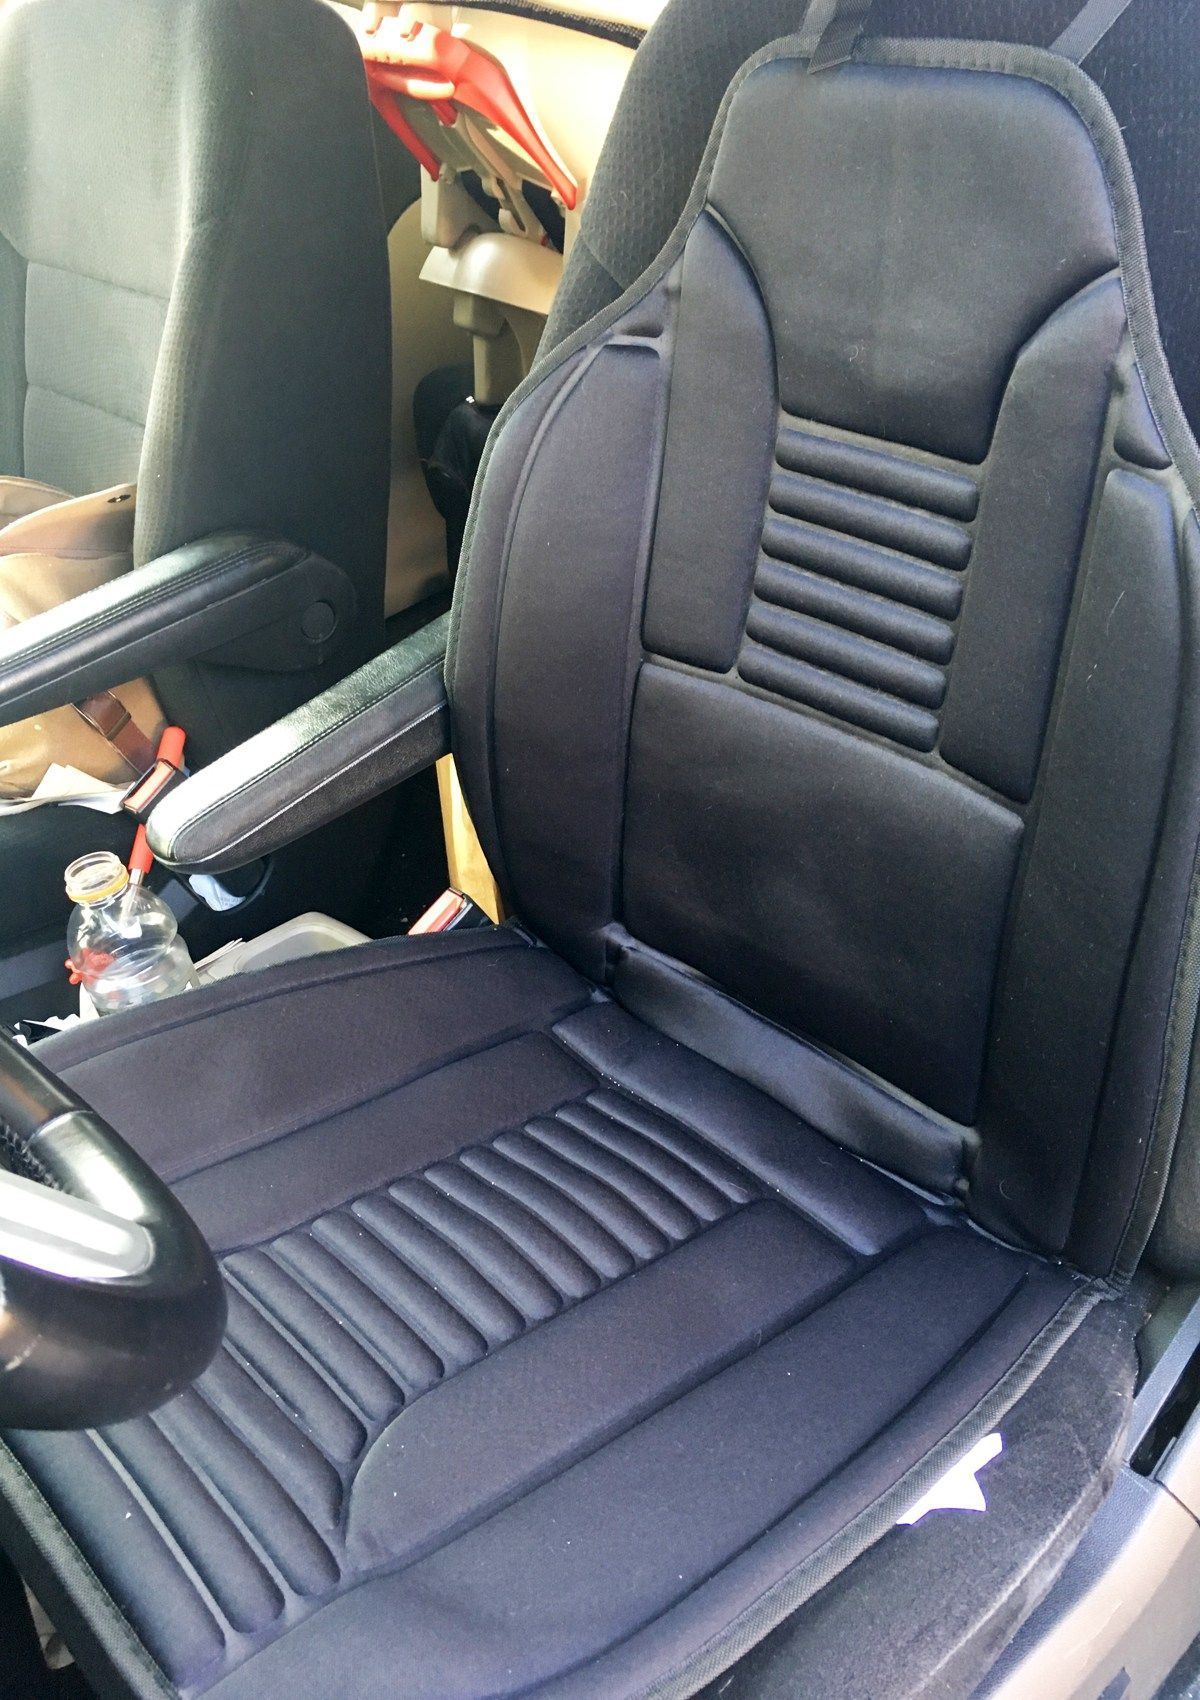 Heated Car Seat Cushion Review Carseats Heatedseats